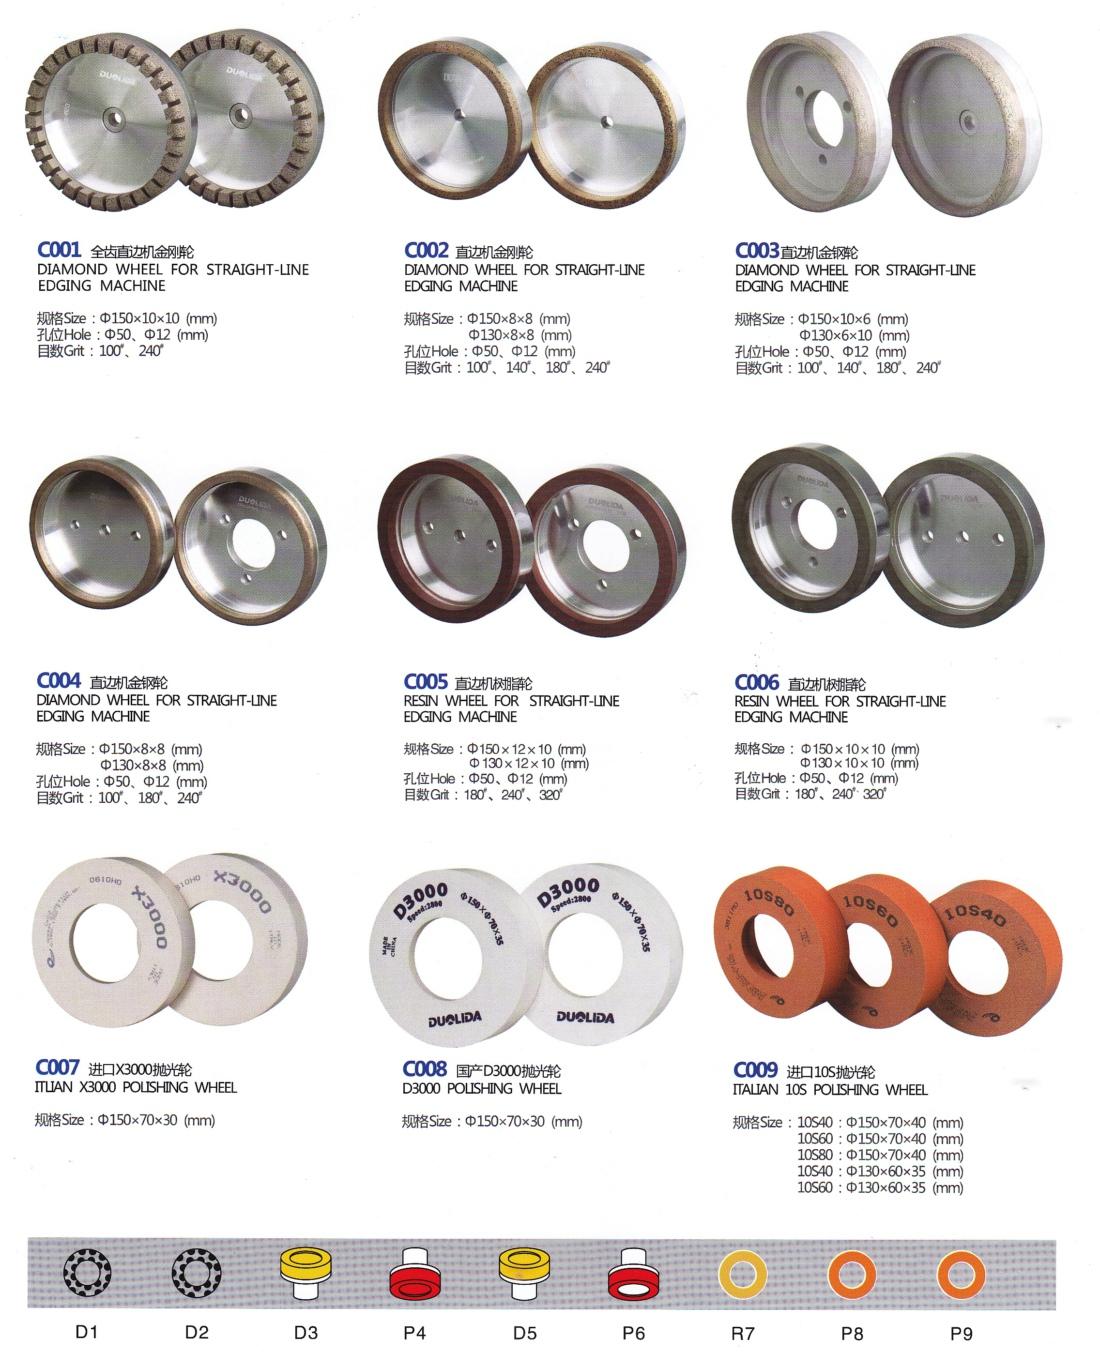 15_Wheels&Accessories for Straight Line Glass Edging Machine